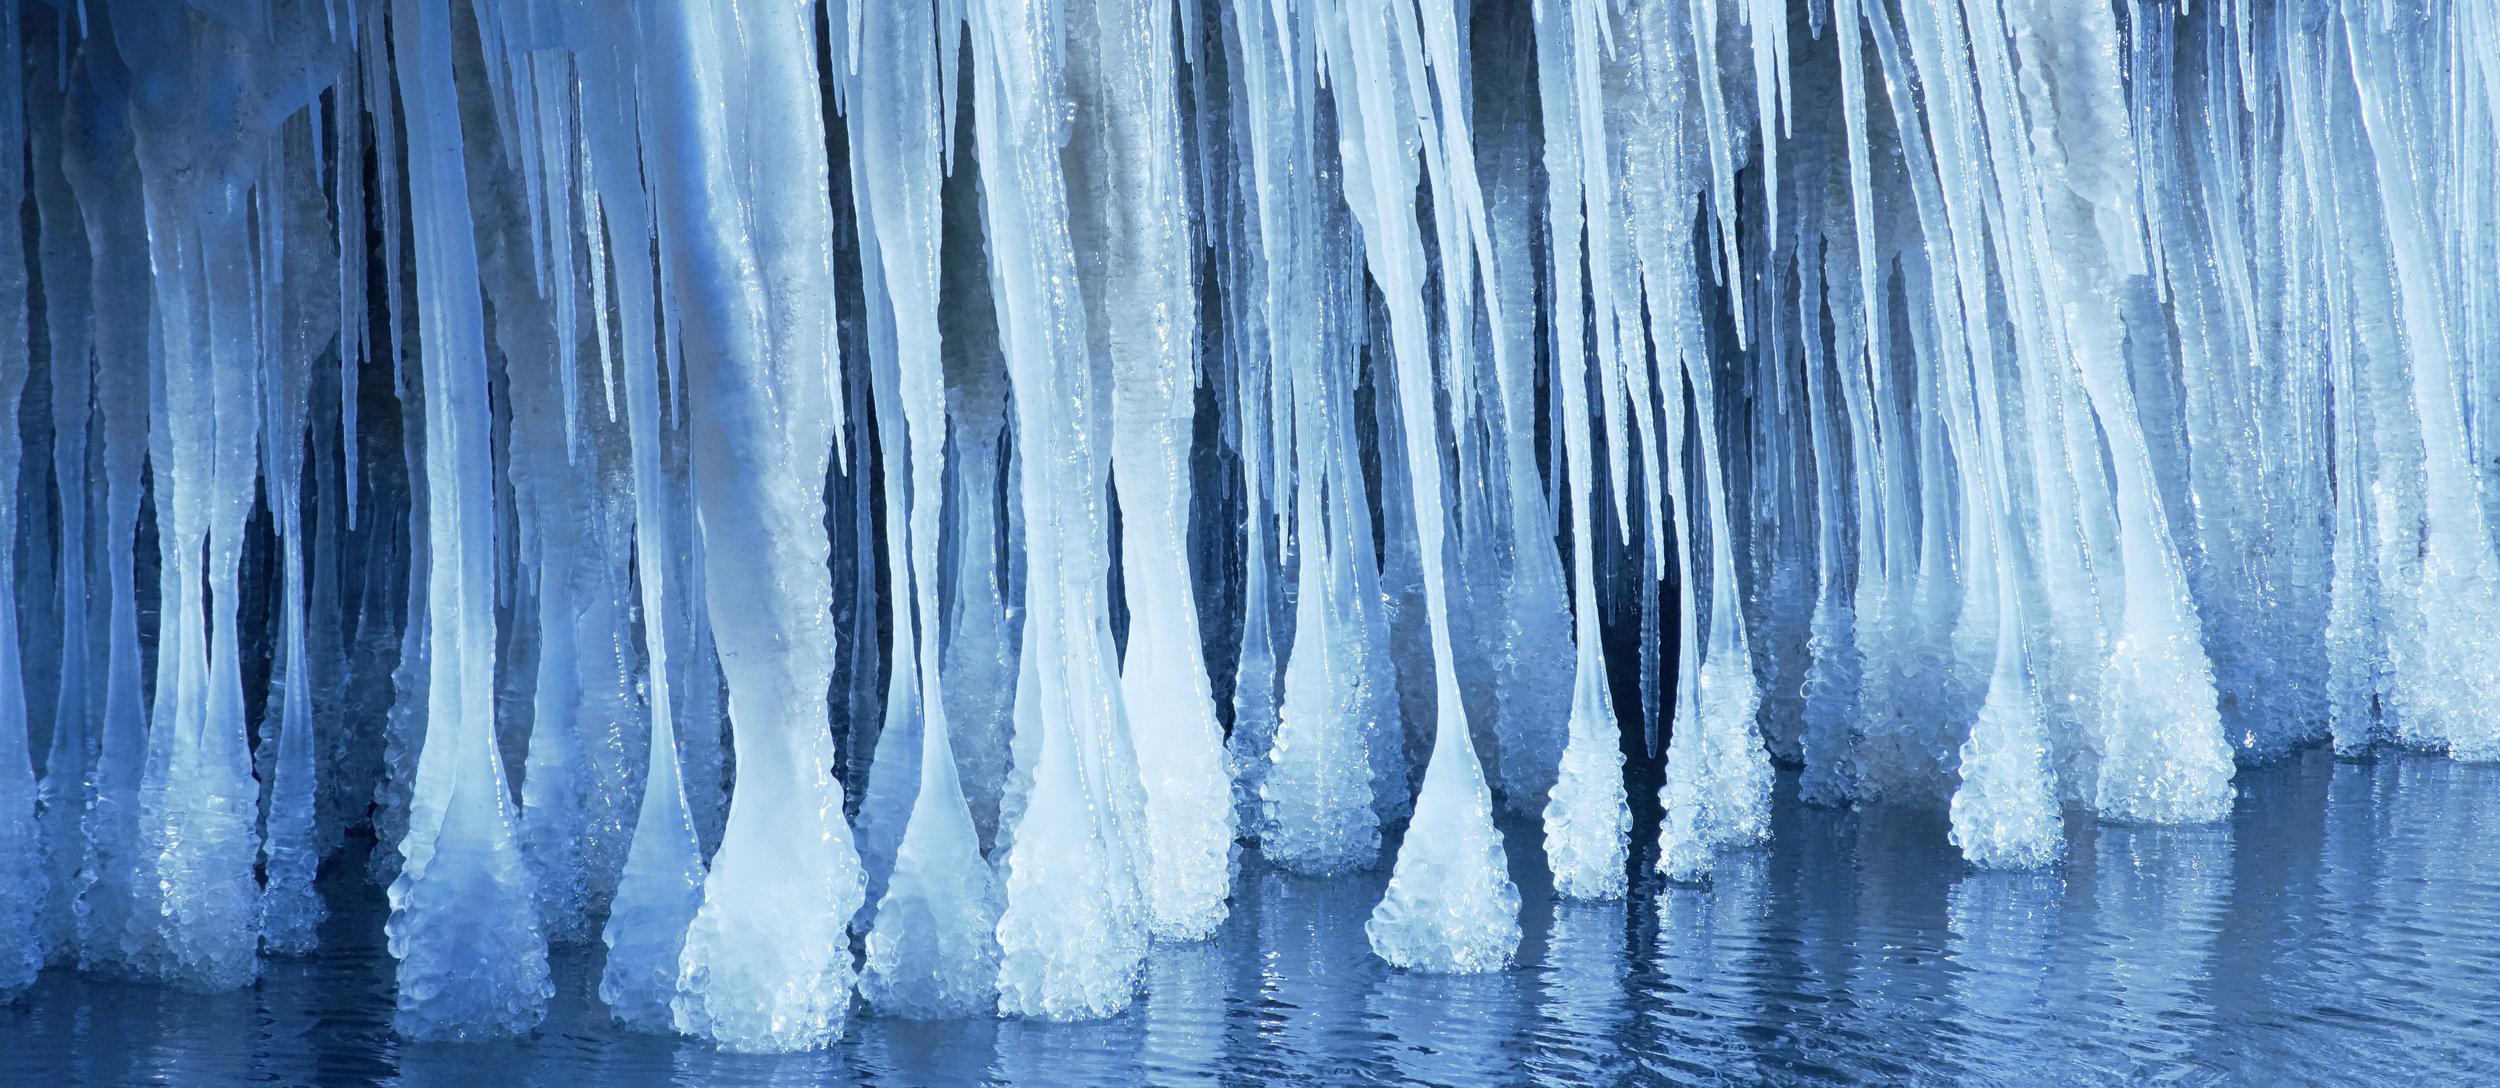 Icee forest.jpg